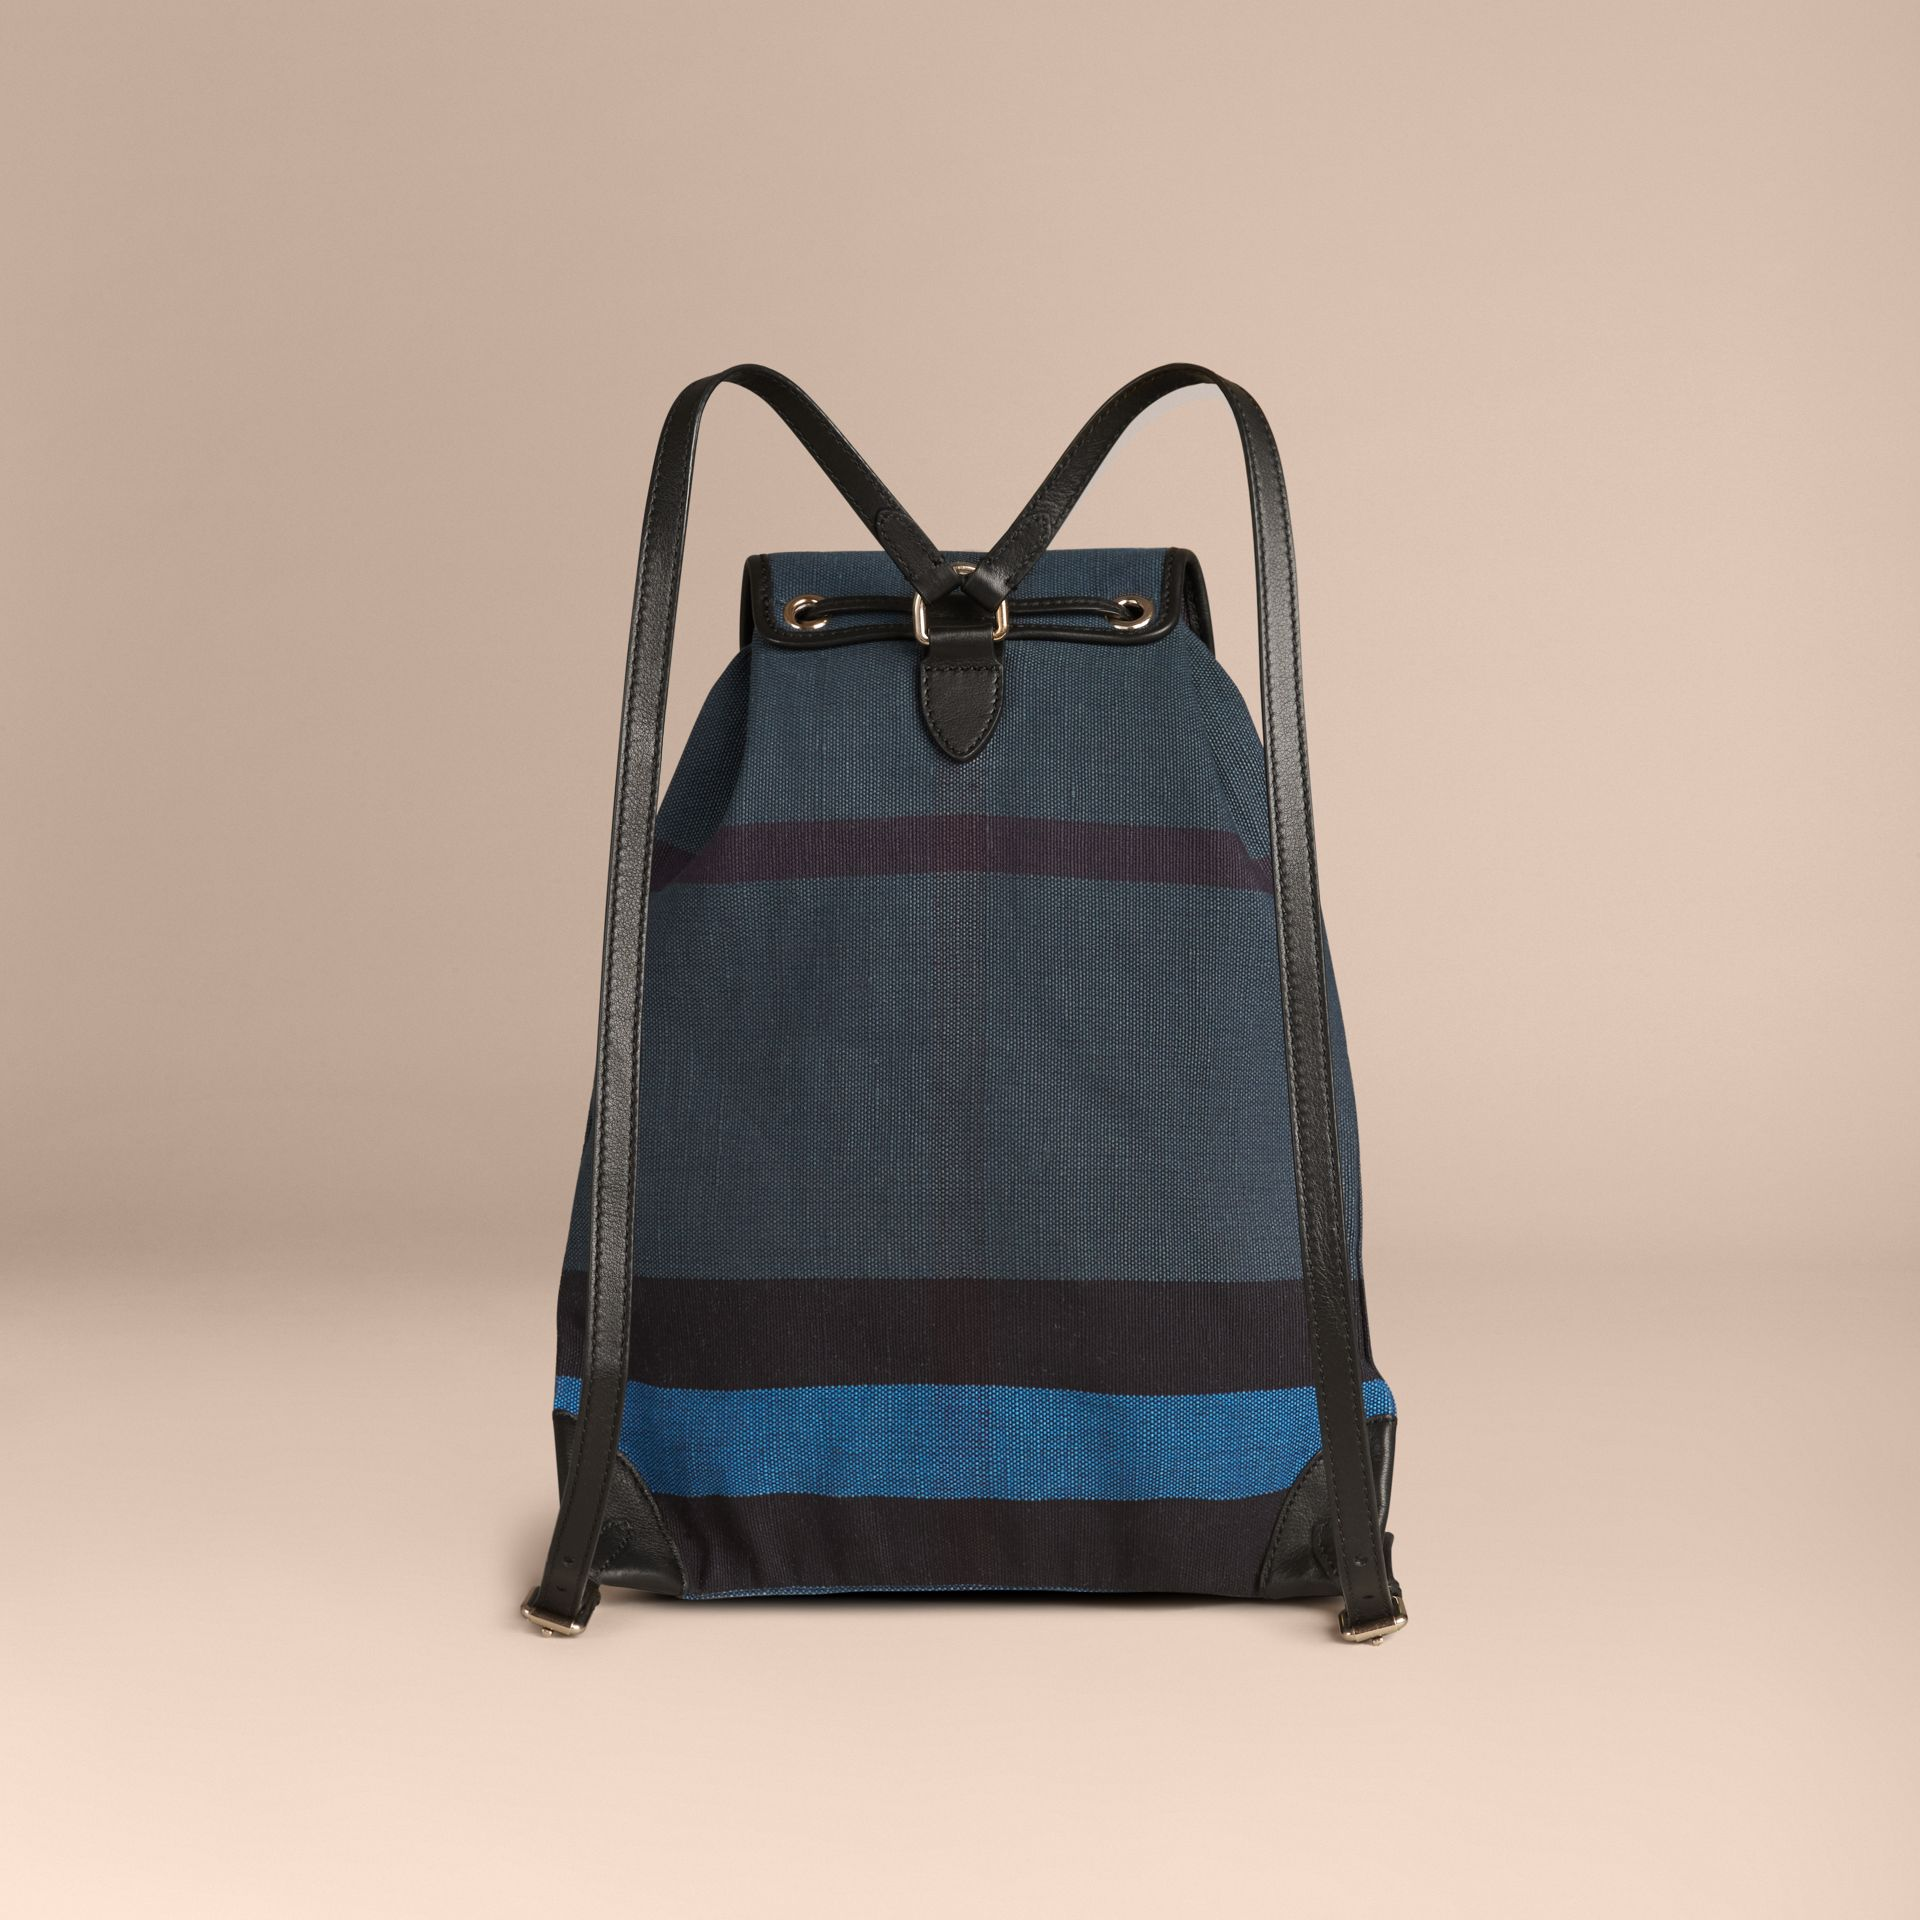 Bleu ultramarine Sac à dos en tissu Canvas check surteint Bleu Ultramarine - photo de la galerie 2